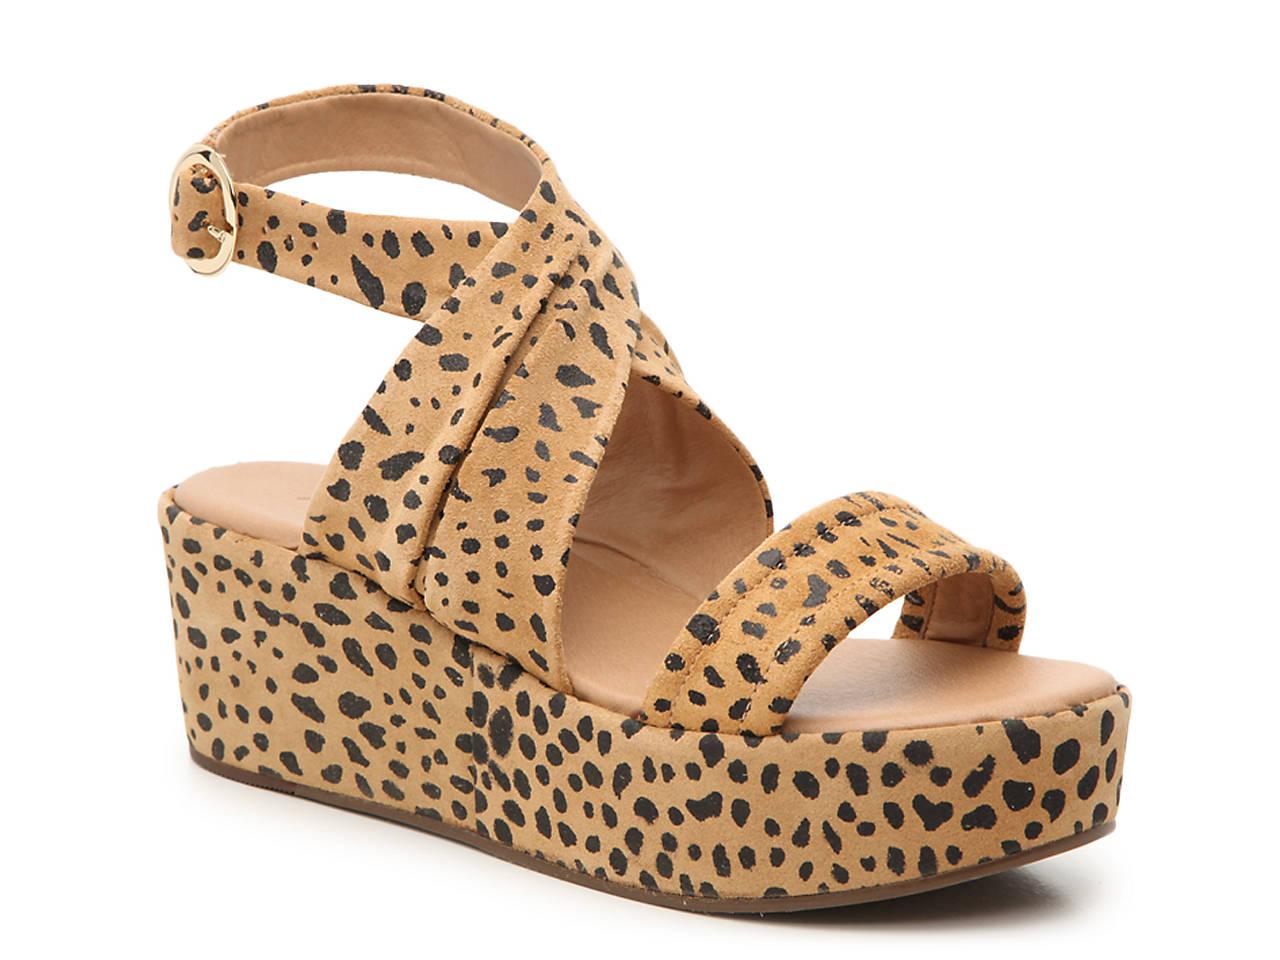 Starline Wedge Sandal by Matisse